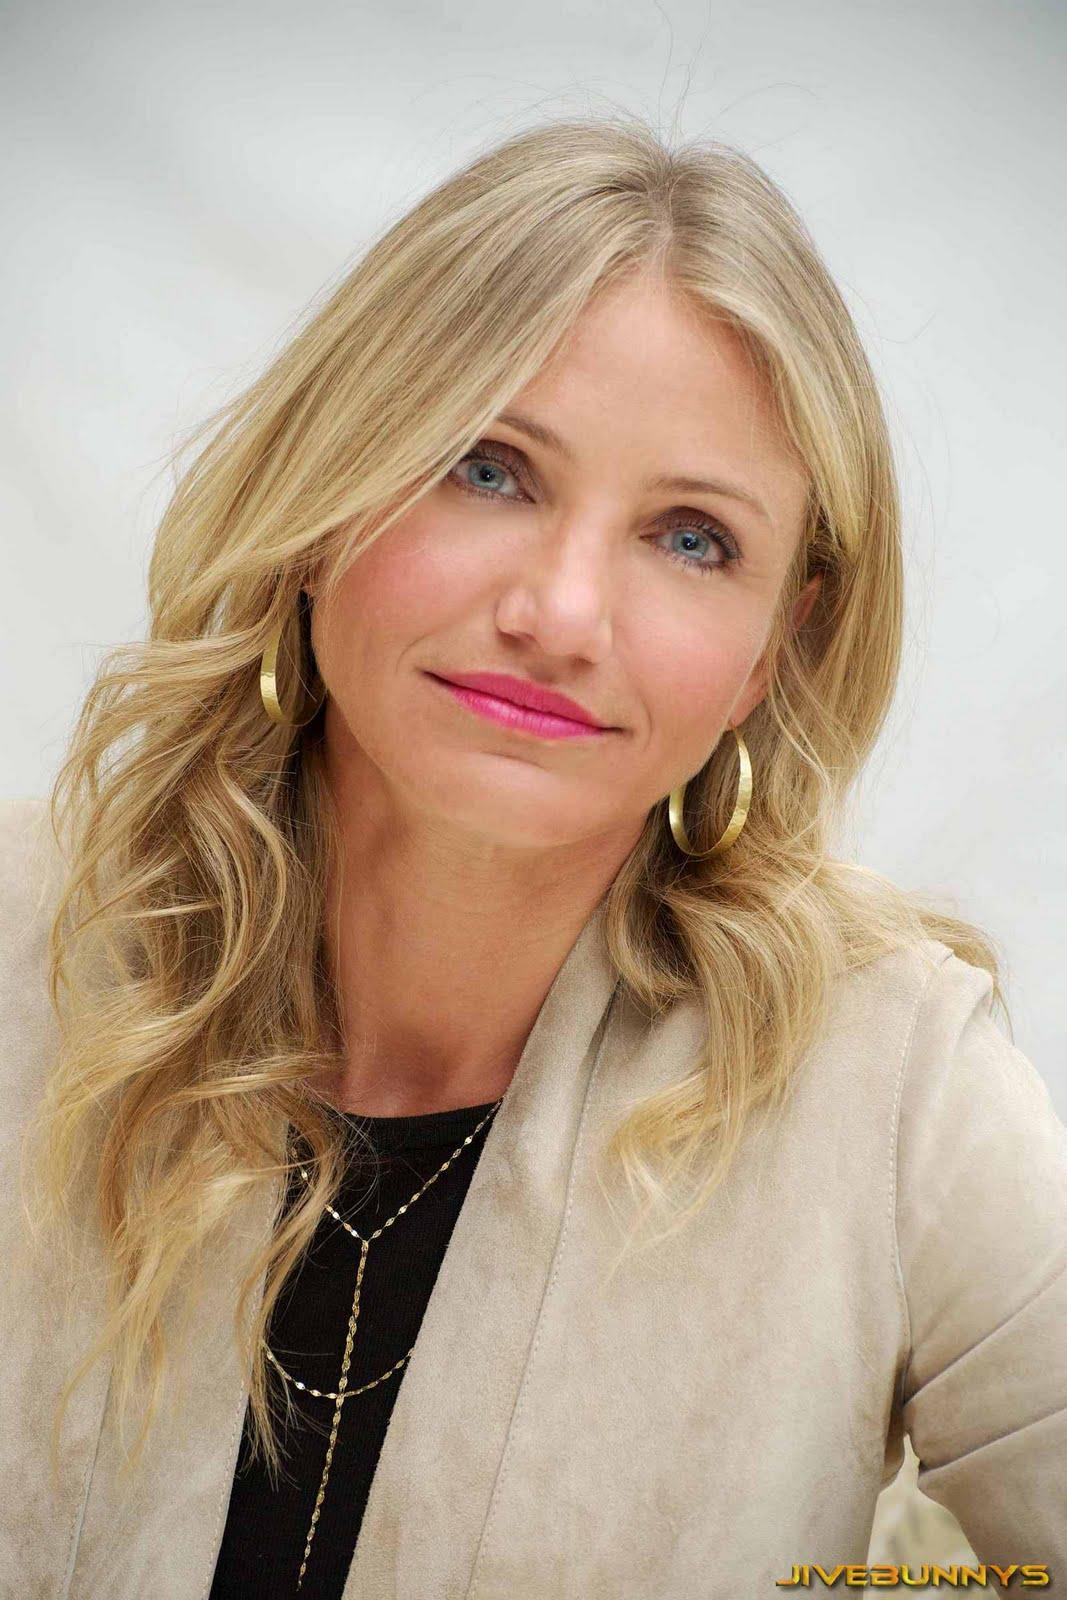 Jivebunnys Female Celebrity Picture Gallery: Cameron Diaz ... Cameron Diaz Movies